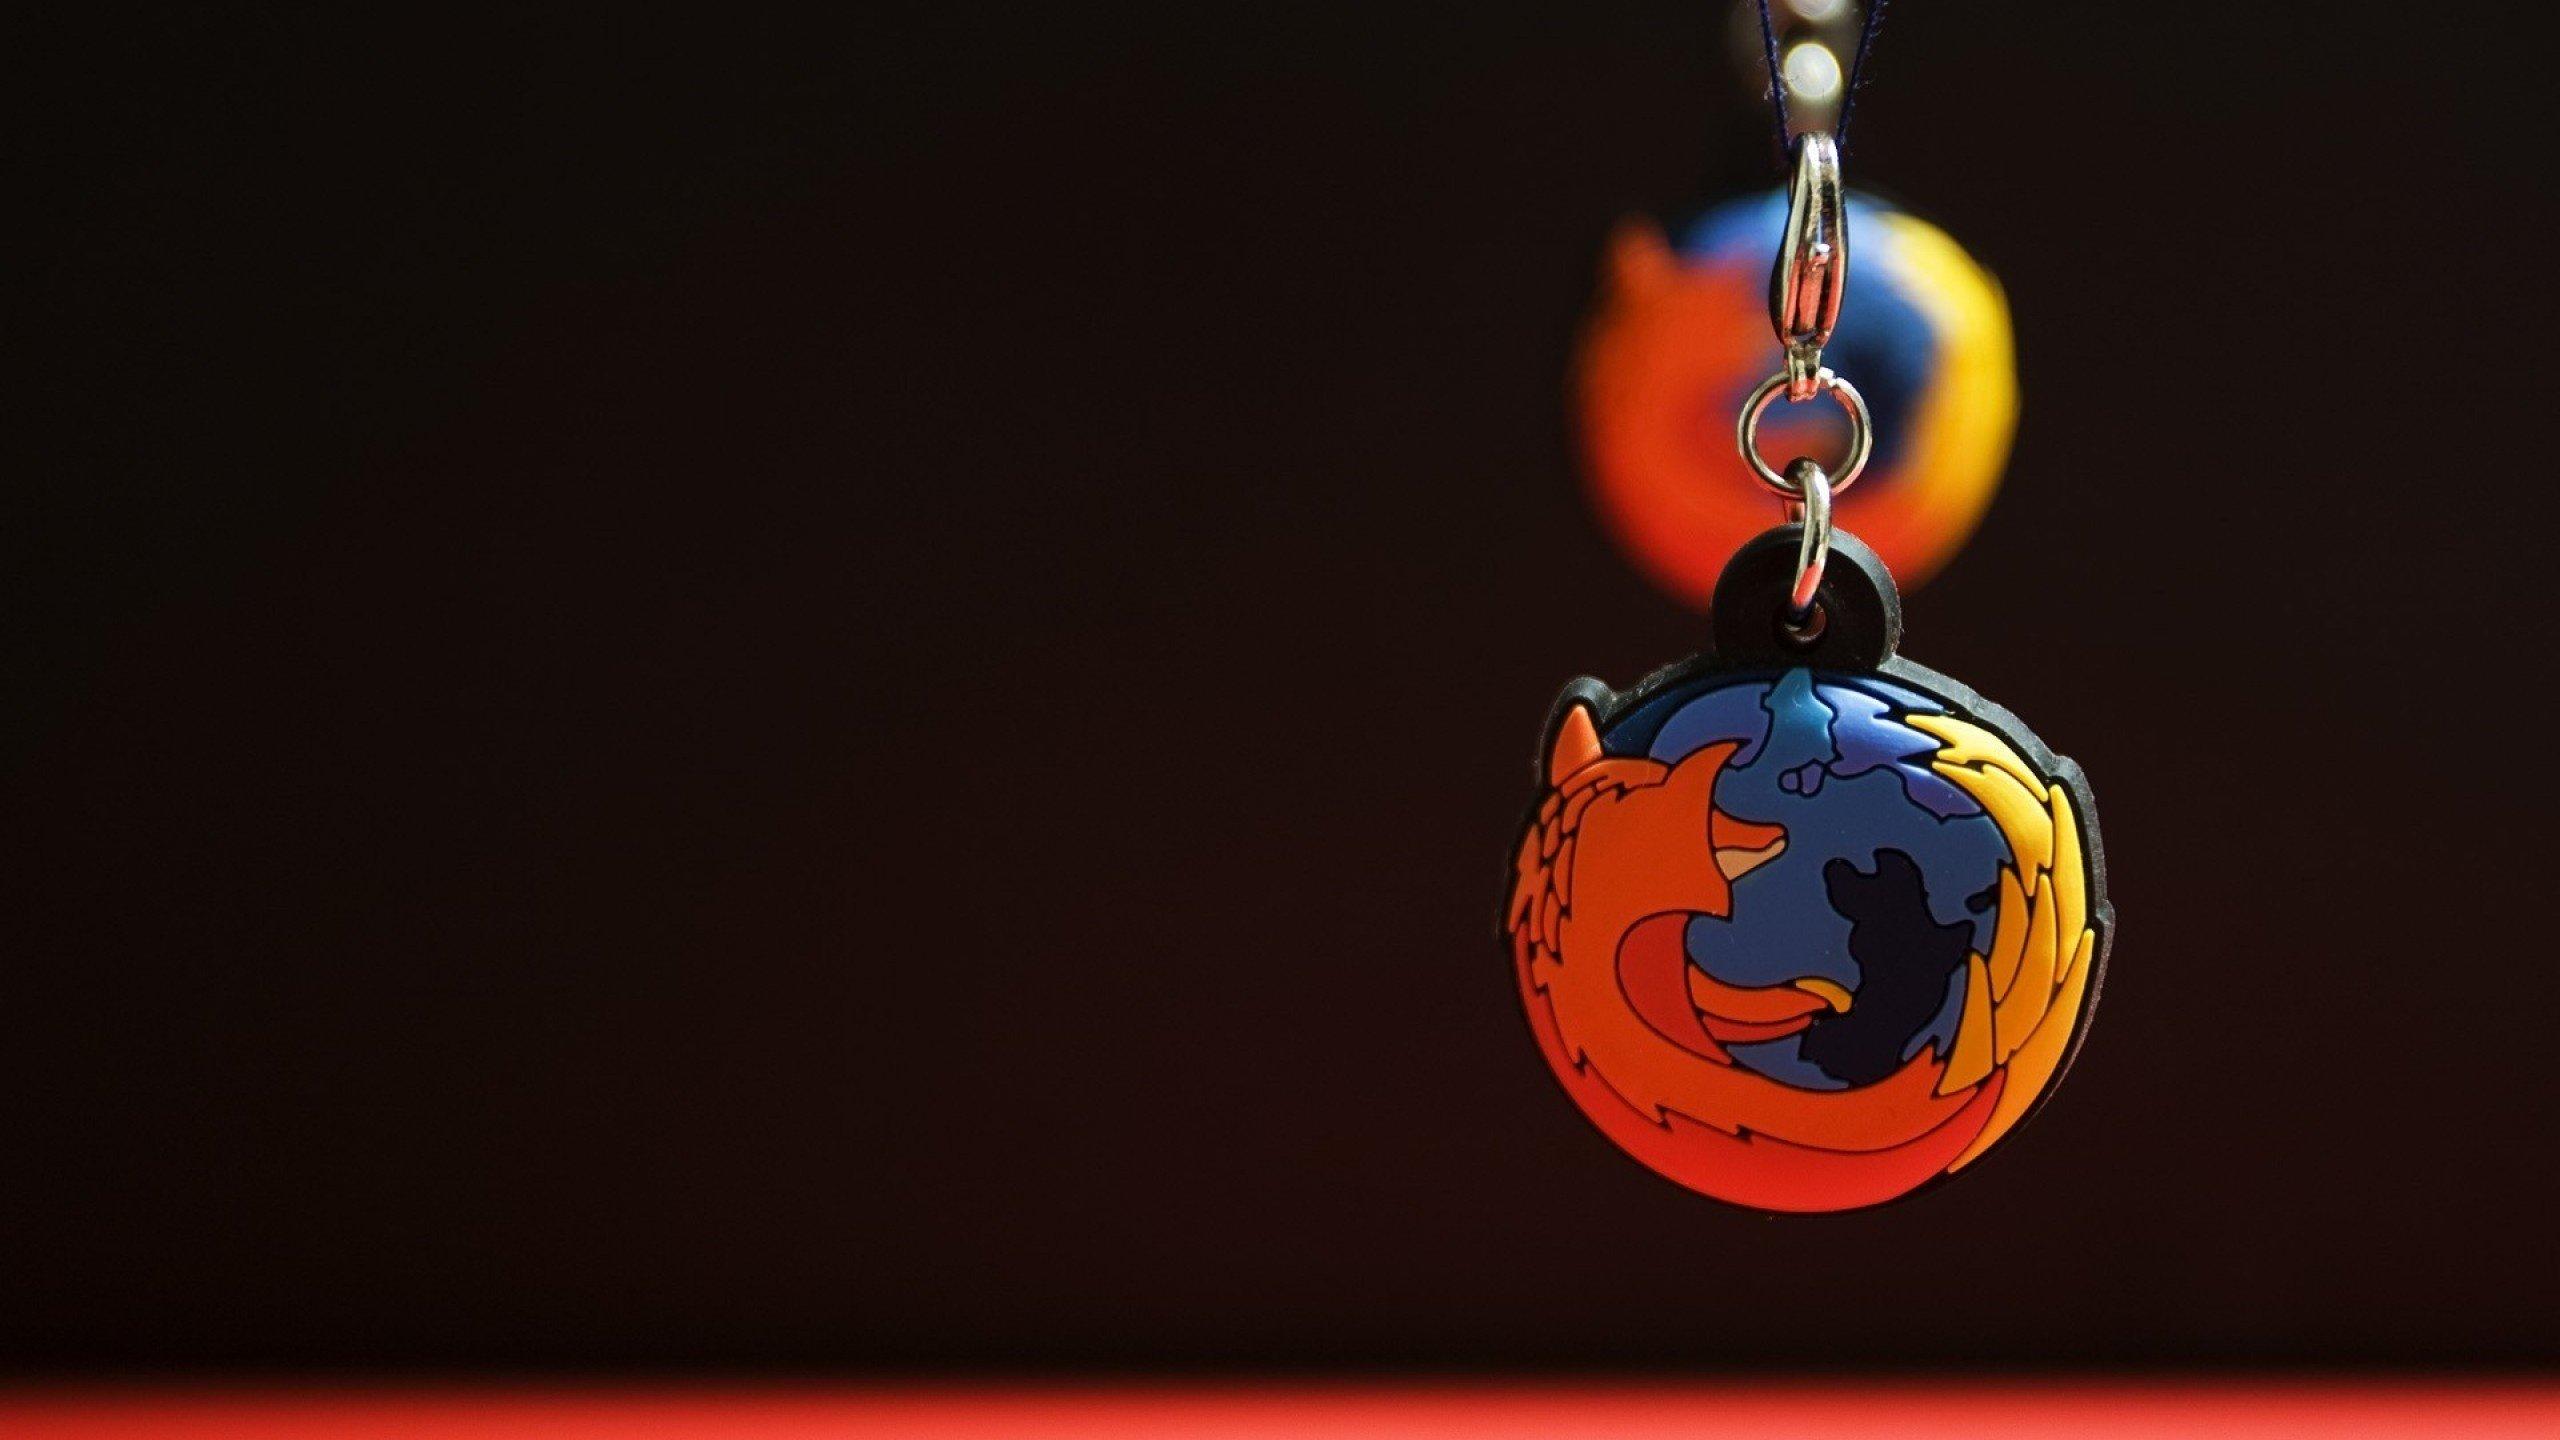 Firefox Keyring 2560 x 1440 2560x1440